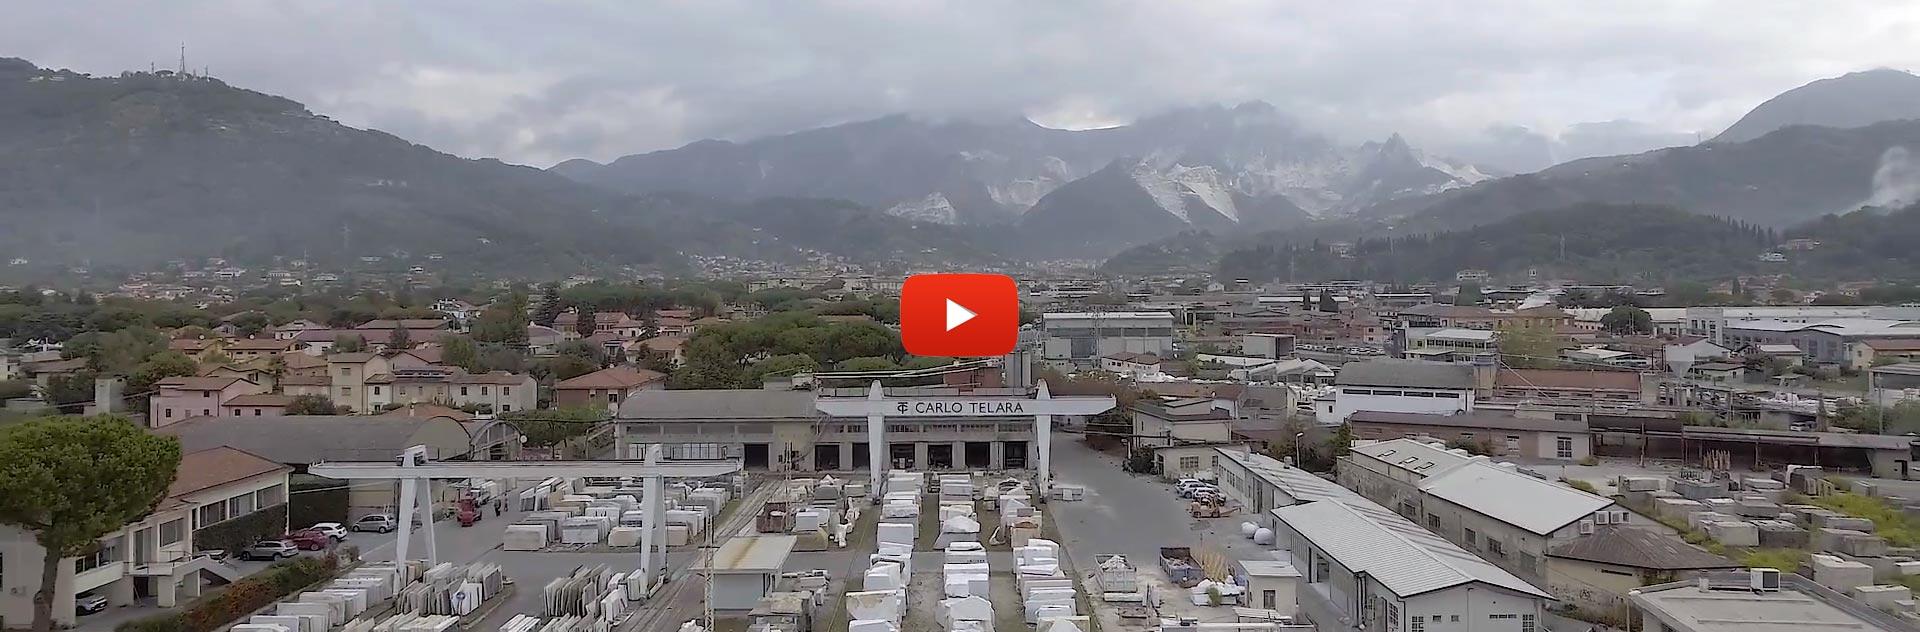 Telara-Marmi-Video-2018